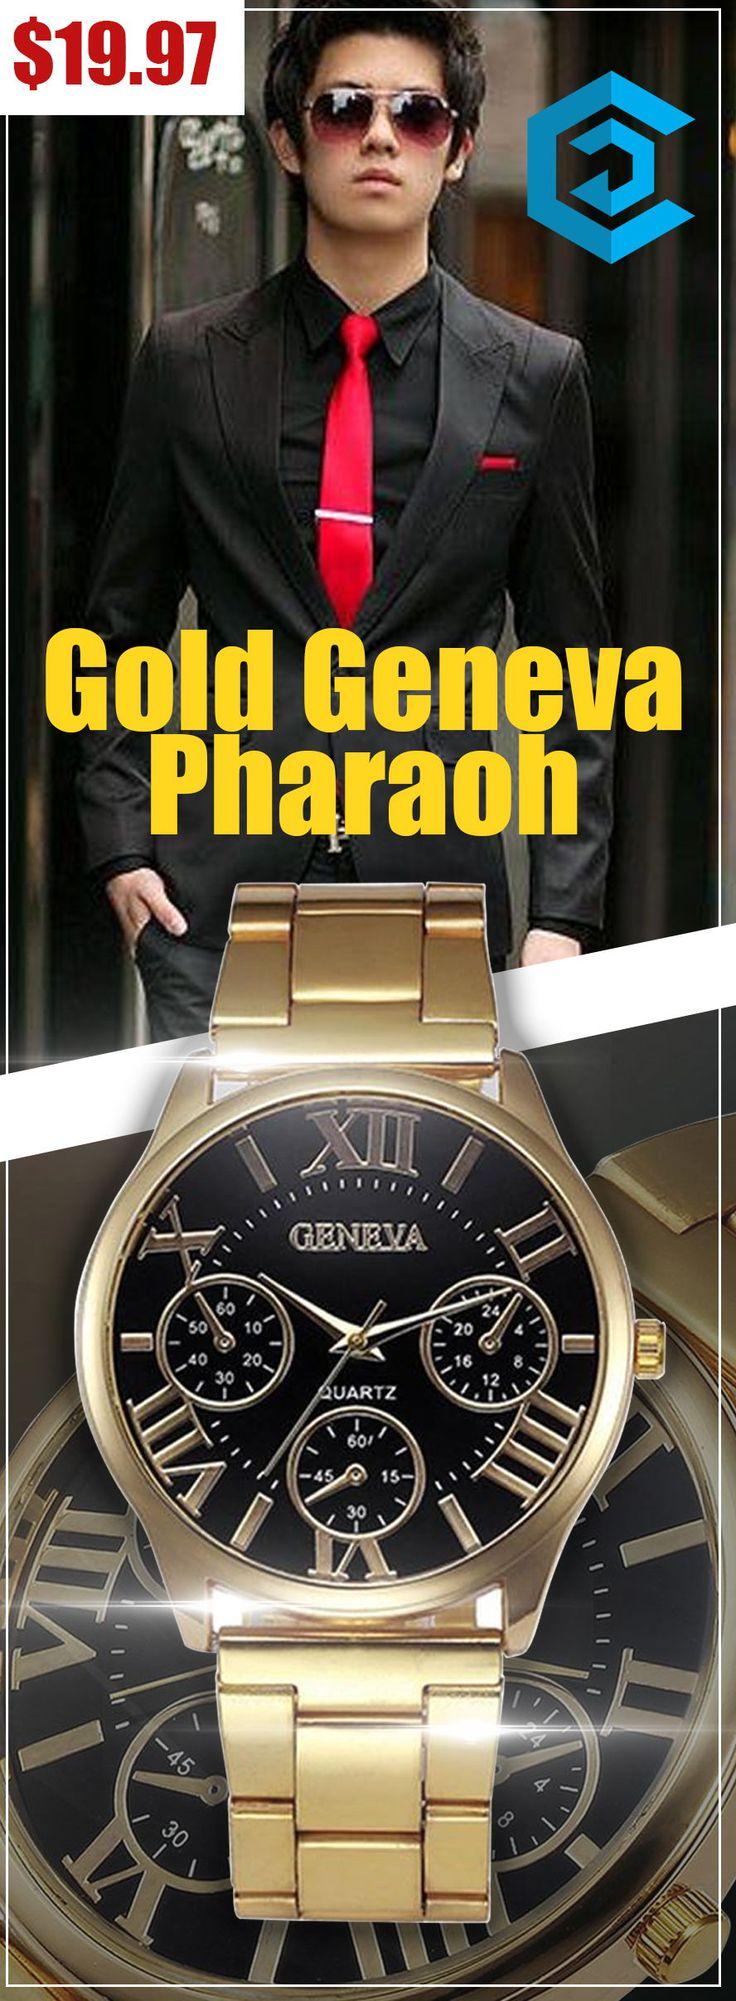 Gold Geneva Pharaoh |affordable| |luxury| |mens| |simple| |watches for men| |unique| |design| #watches #luxury #fashion #unique